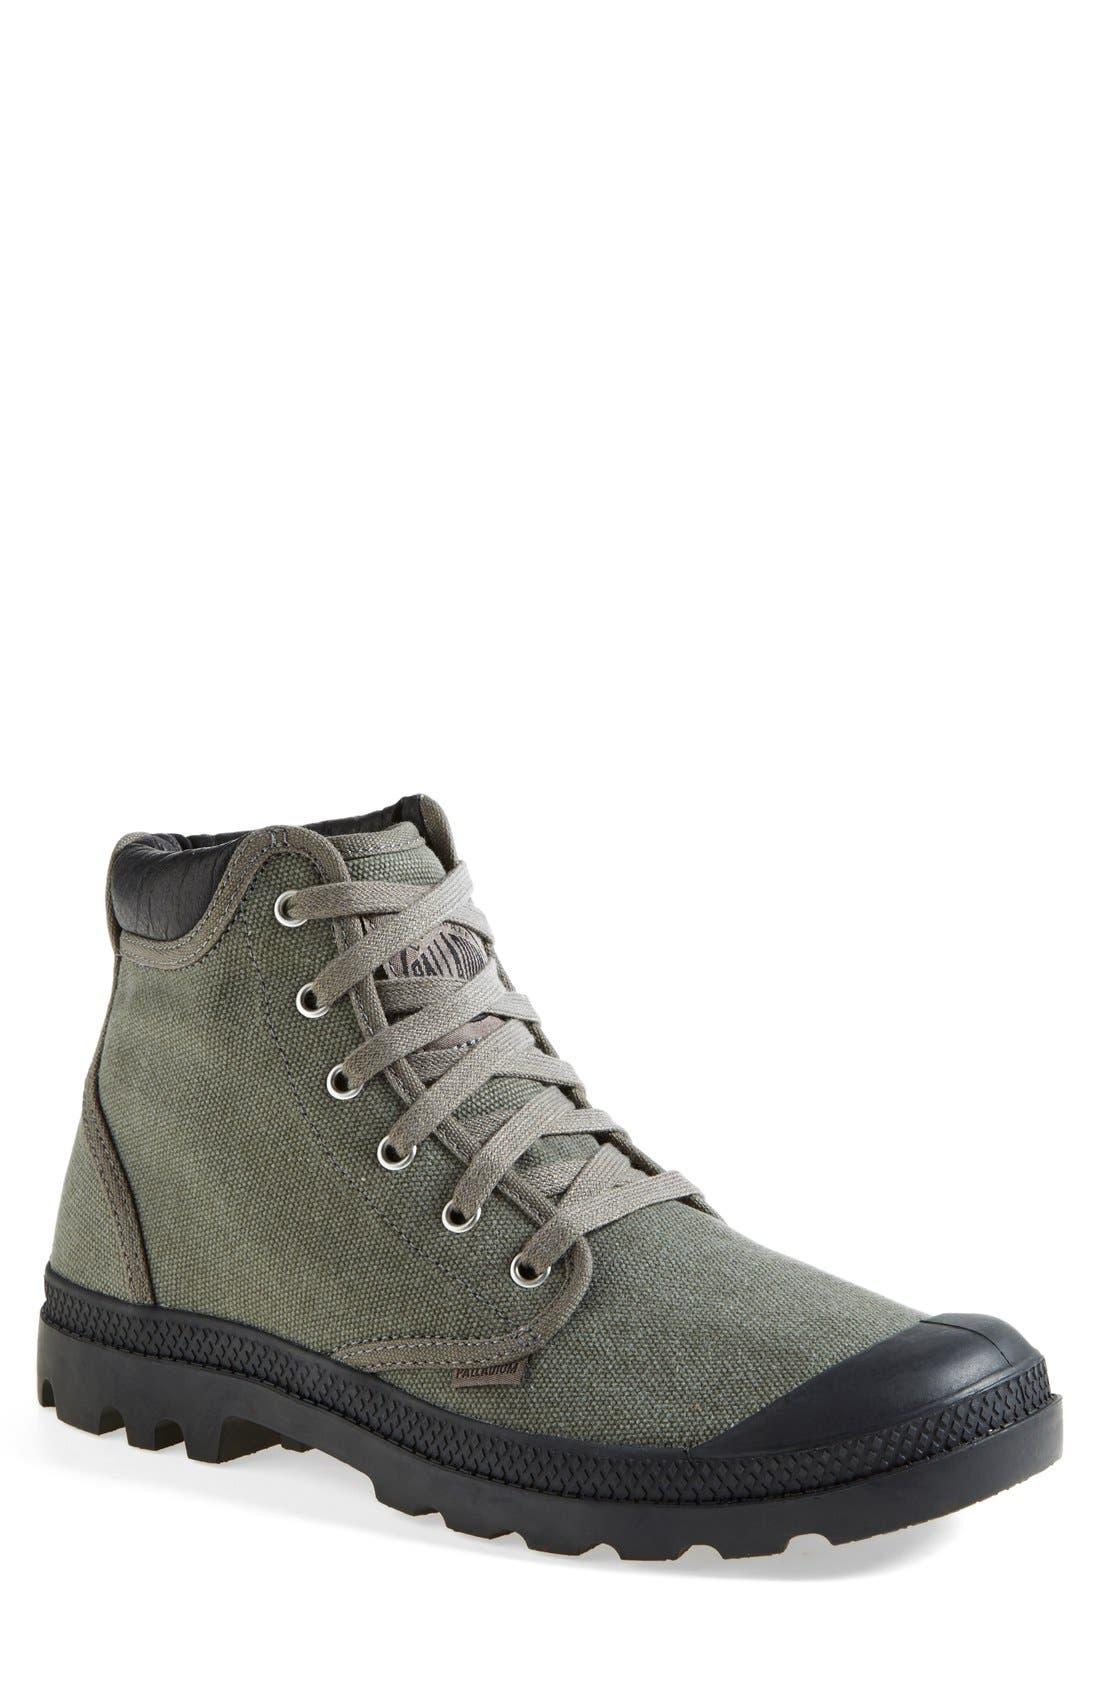 Main Image - Palladium 'Pampa Hi' Boot